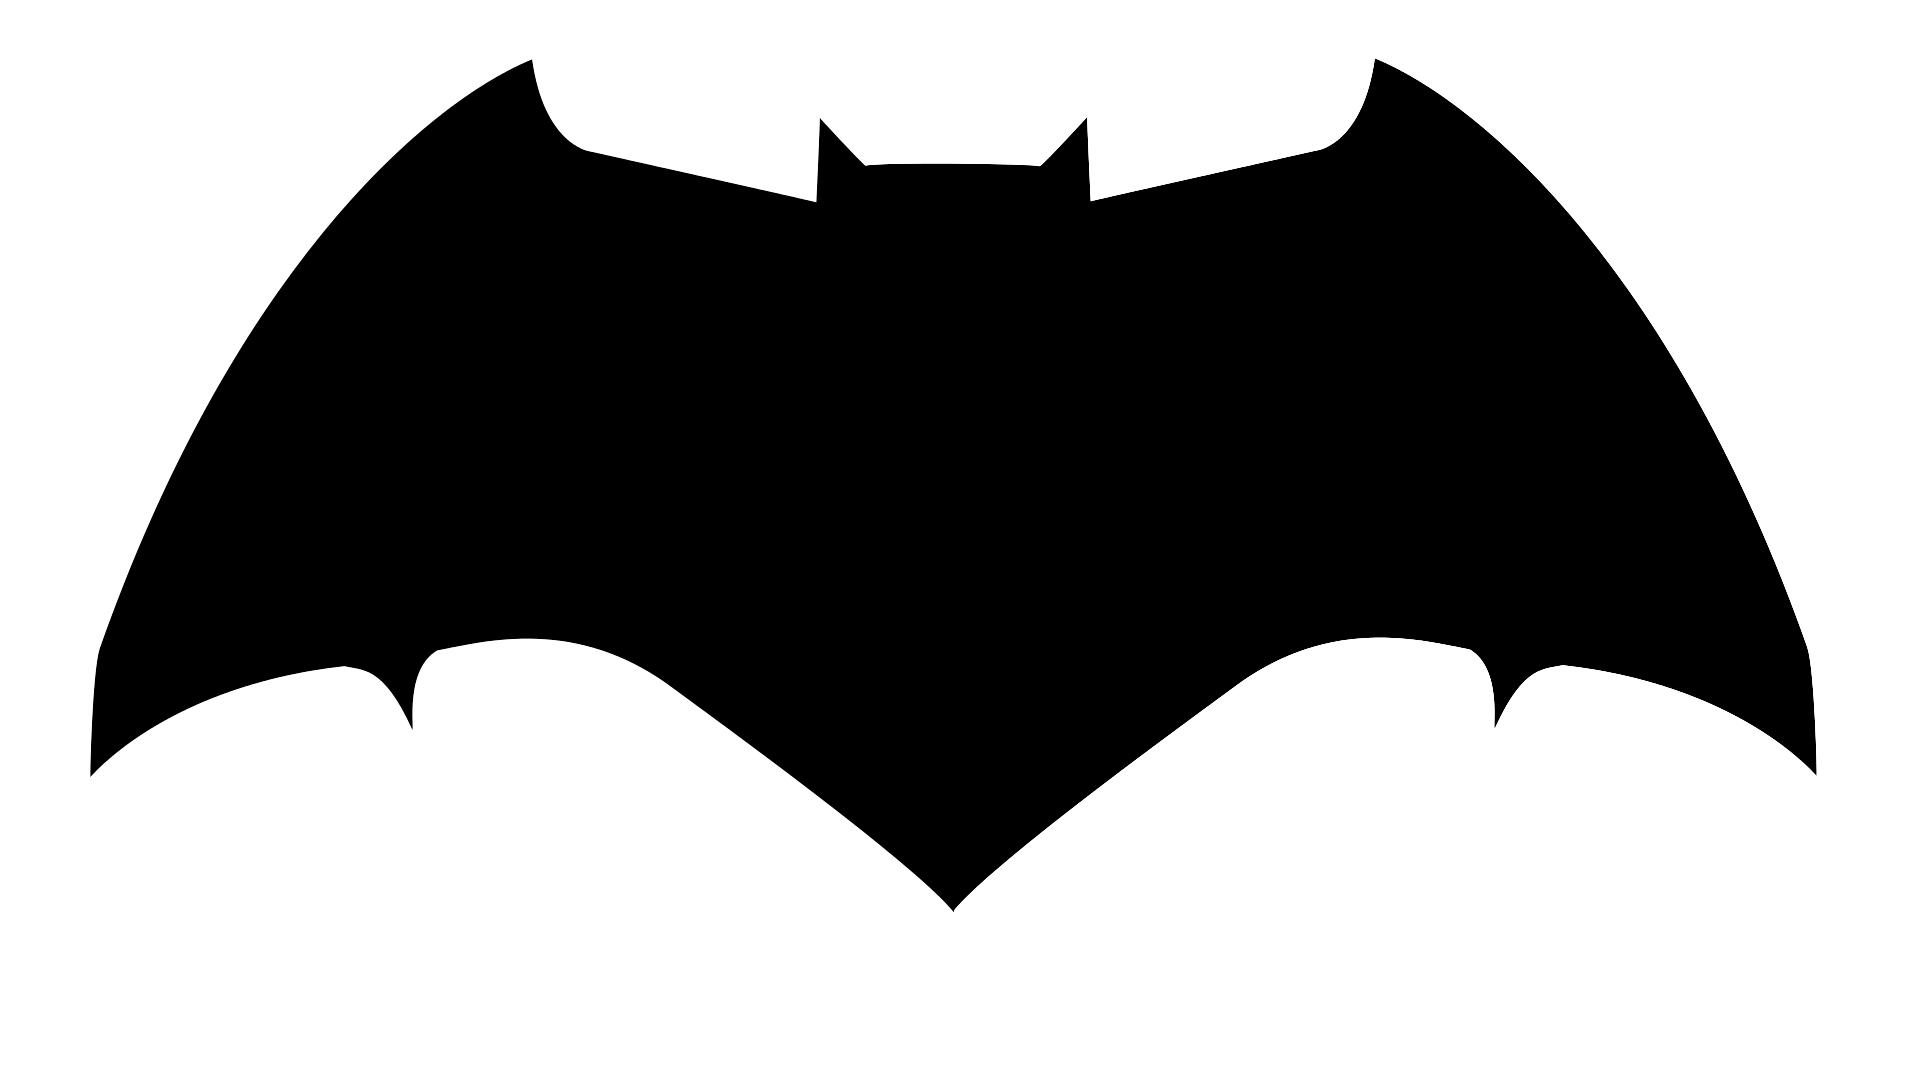 Latest Details On Upcoming Batman Movie Nerd Things